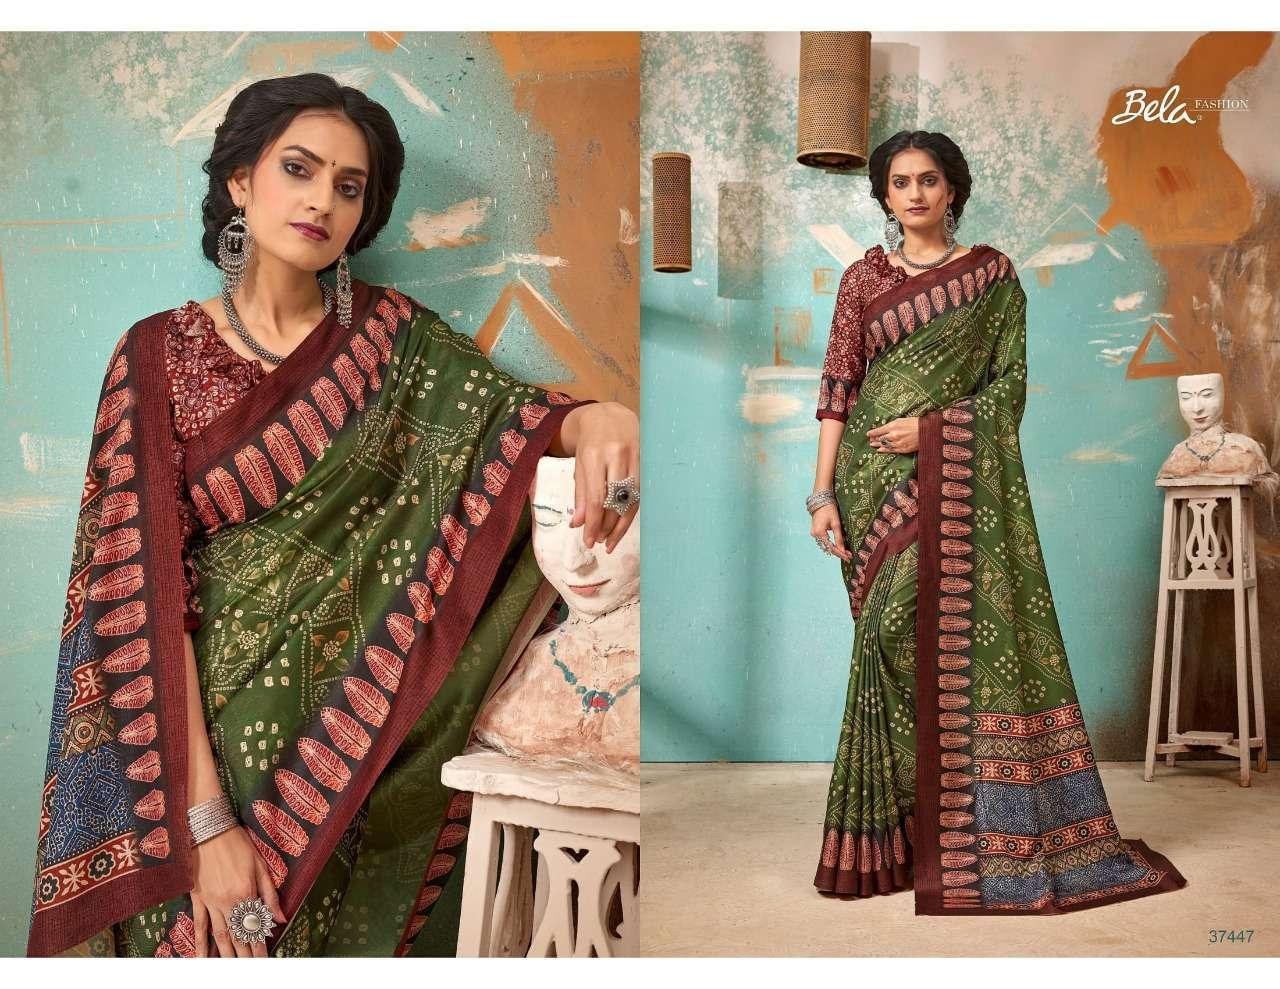 Bela Fashion Tulsi Khadi Silk With Digital Print Sarees Collection 06